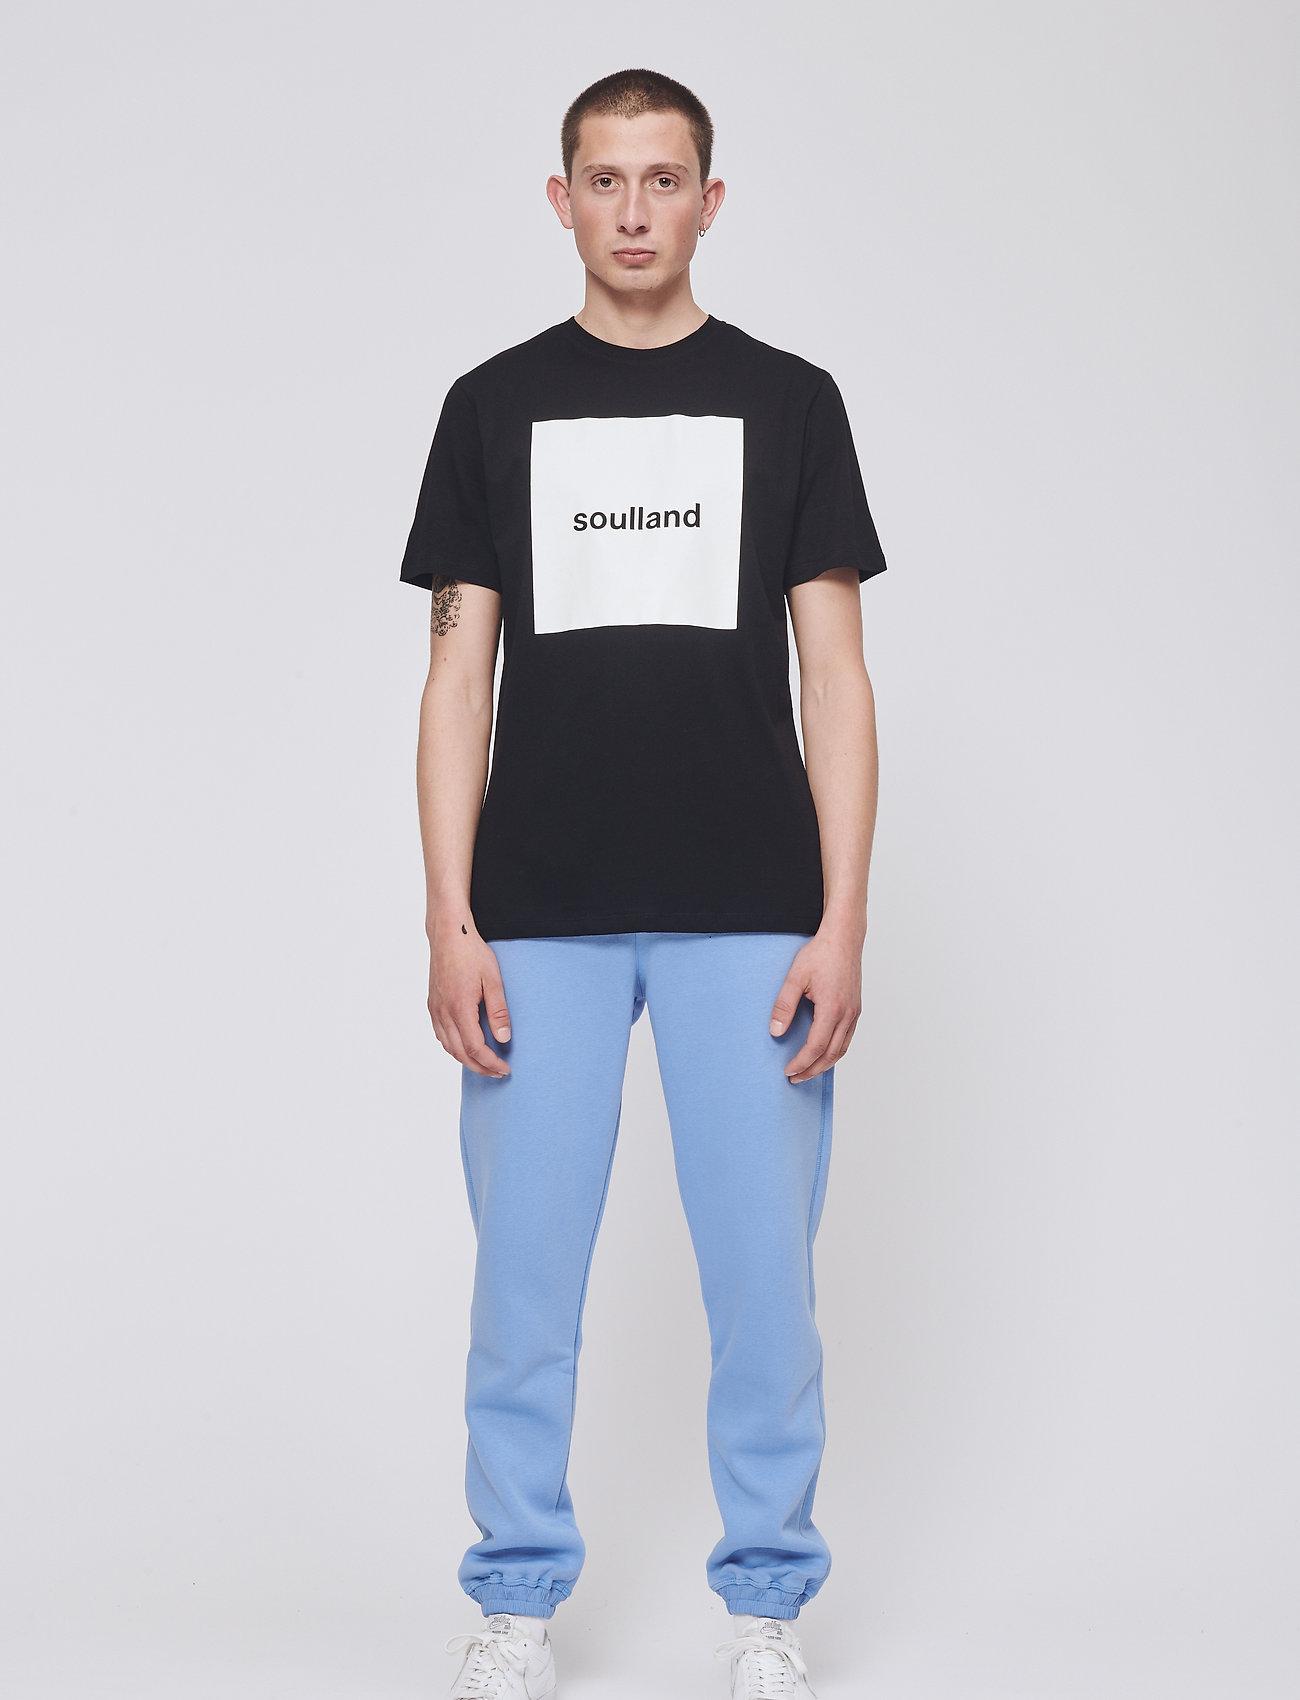 Soulland - MASON - t-shirts - black